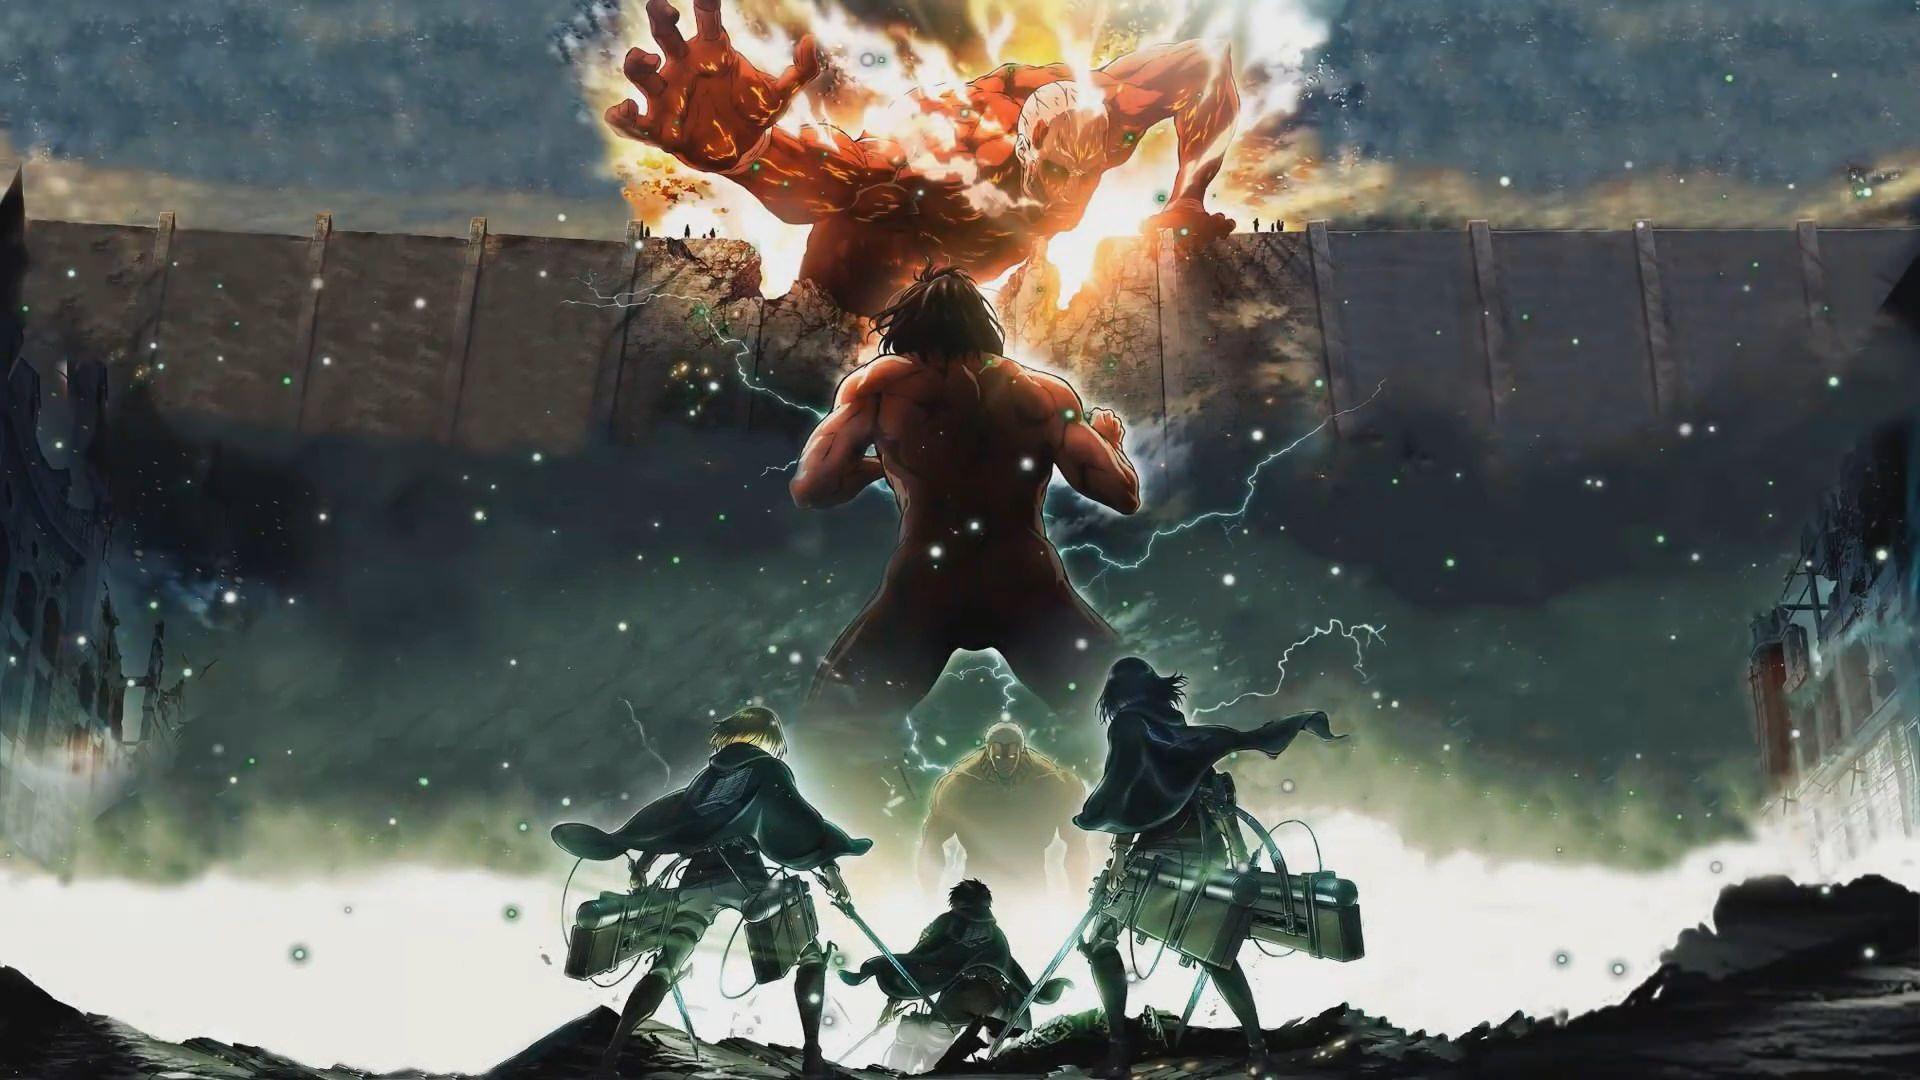 1920x1080 Attack On Titan Anime Animated Wallpaper